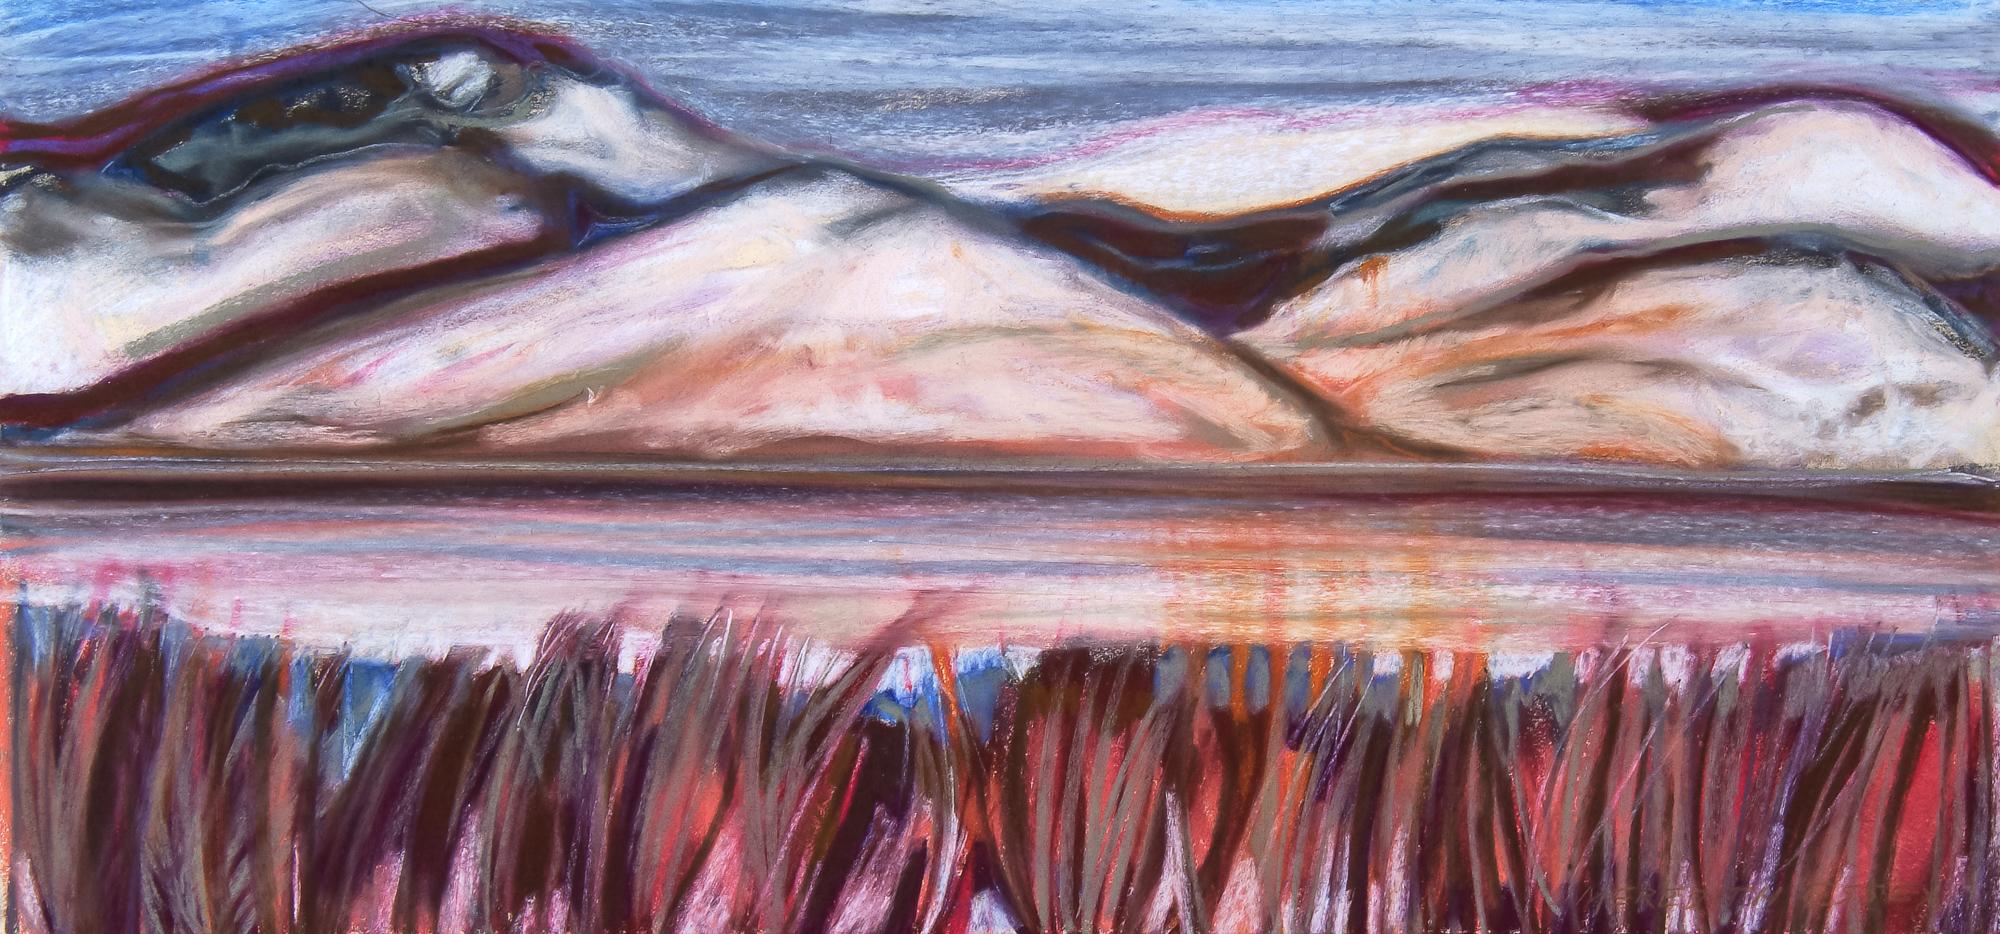 Chelan 22x30, pastel on paper